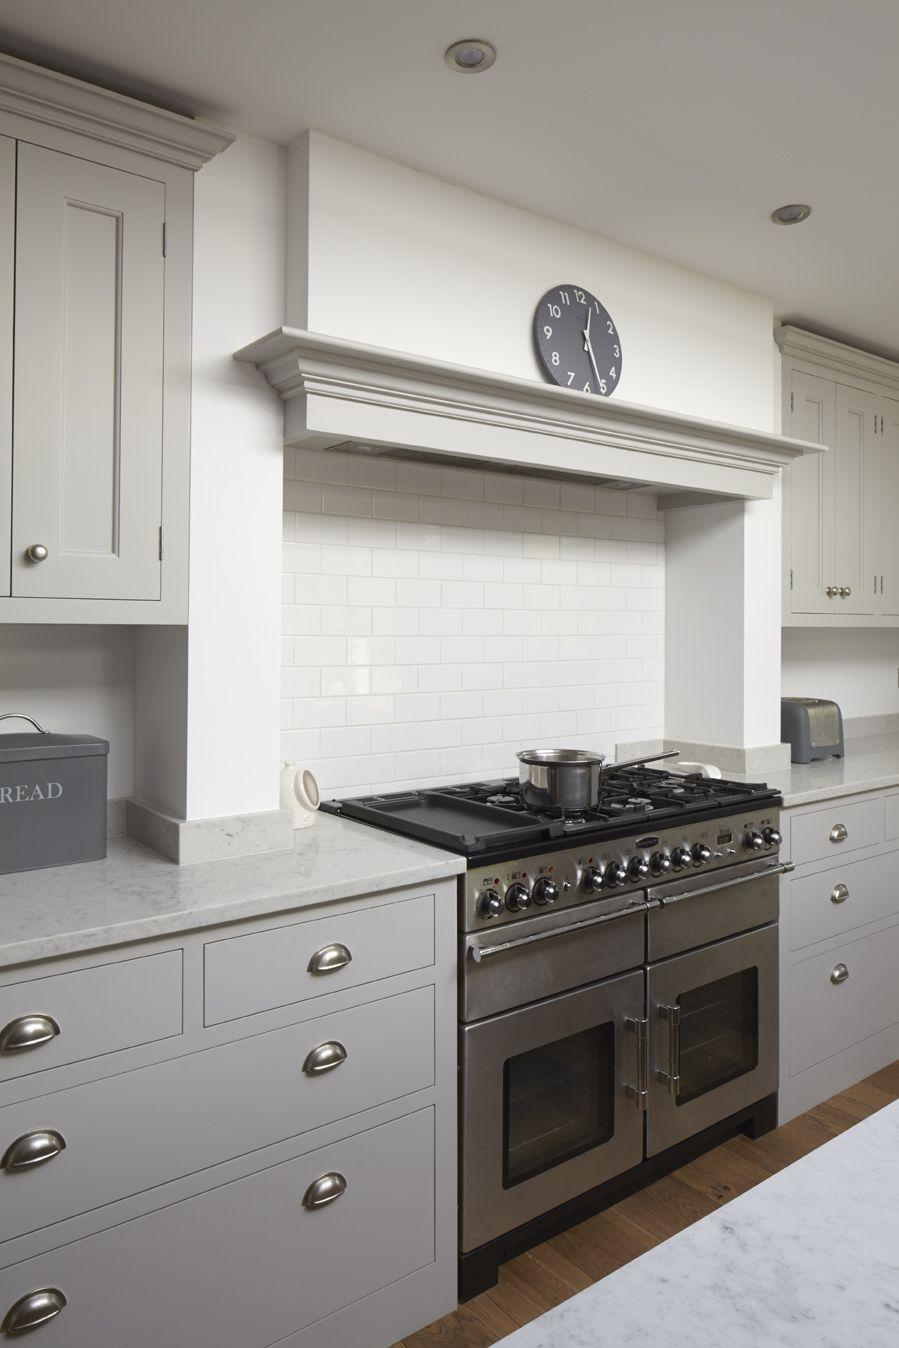 Uncategorized Kitchen Appliances Surrey traditional painted kitchen in hinchley wood surrey featuring a larder teltos carrara worktop